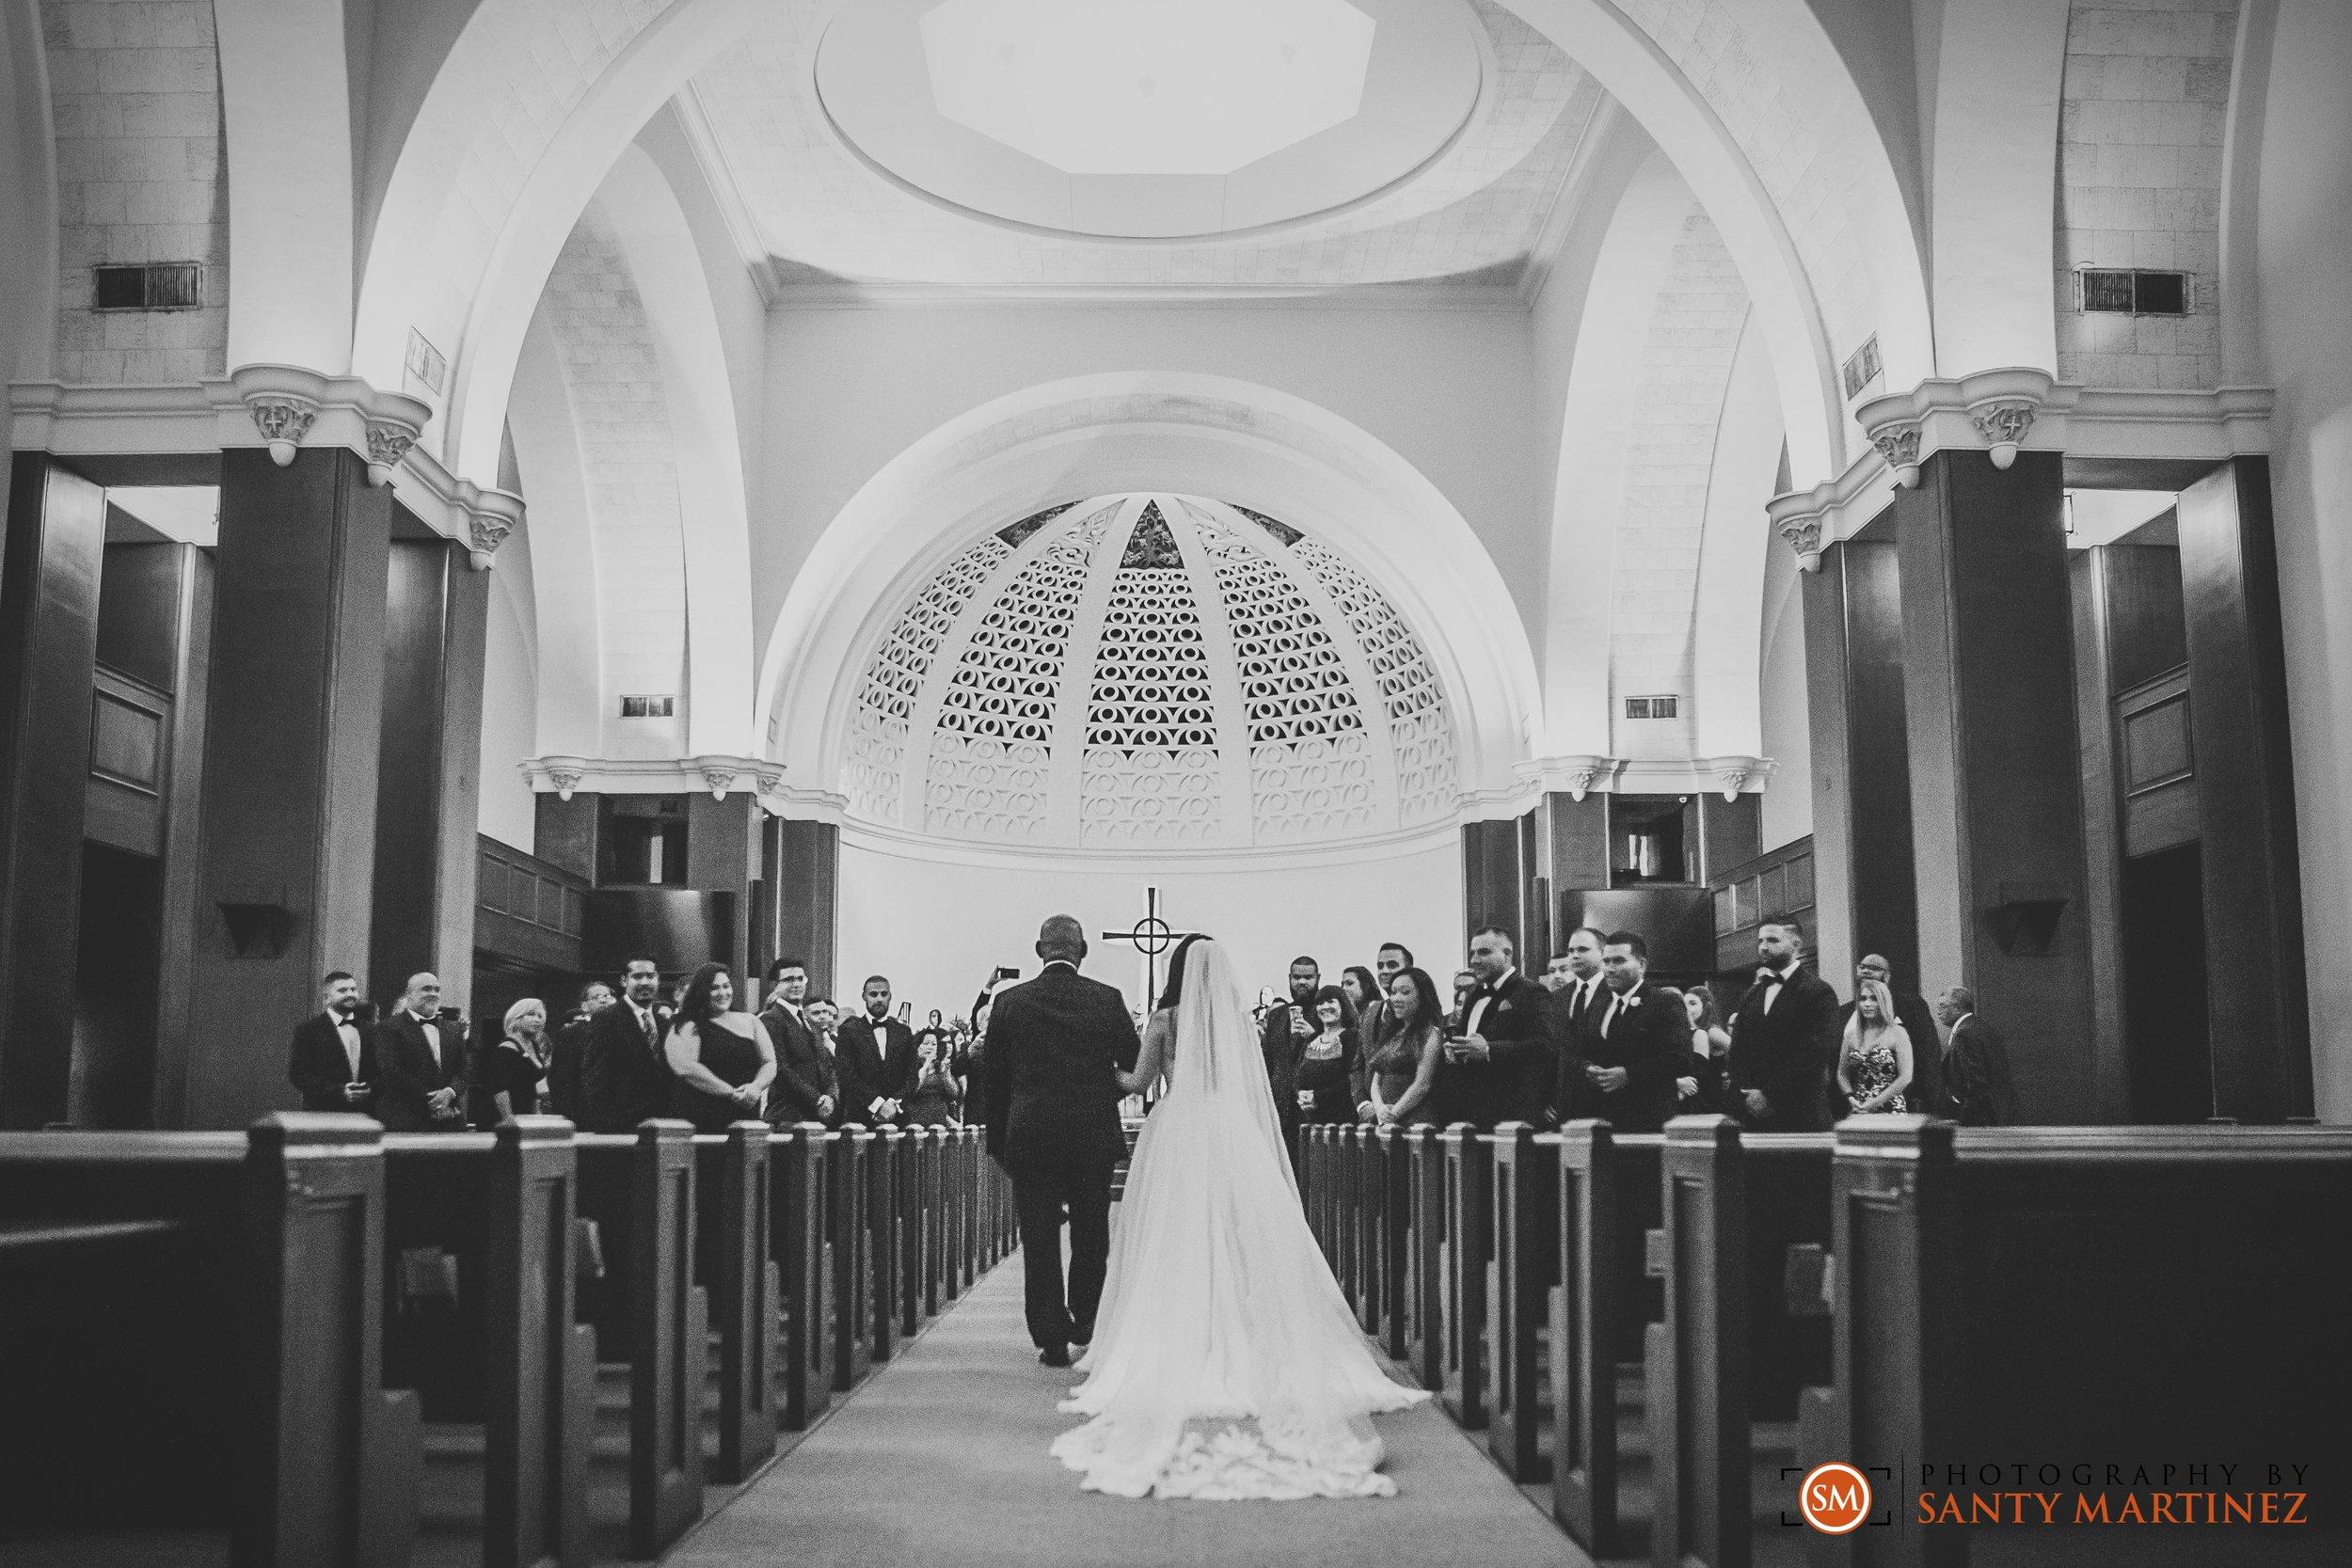 Wedding First Miami Presbyterian Church - Photography by Santy Martinez-18.jpg